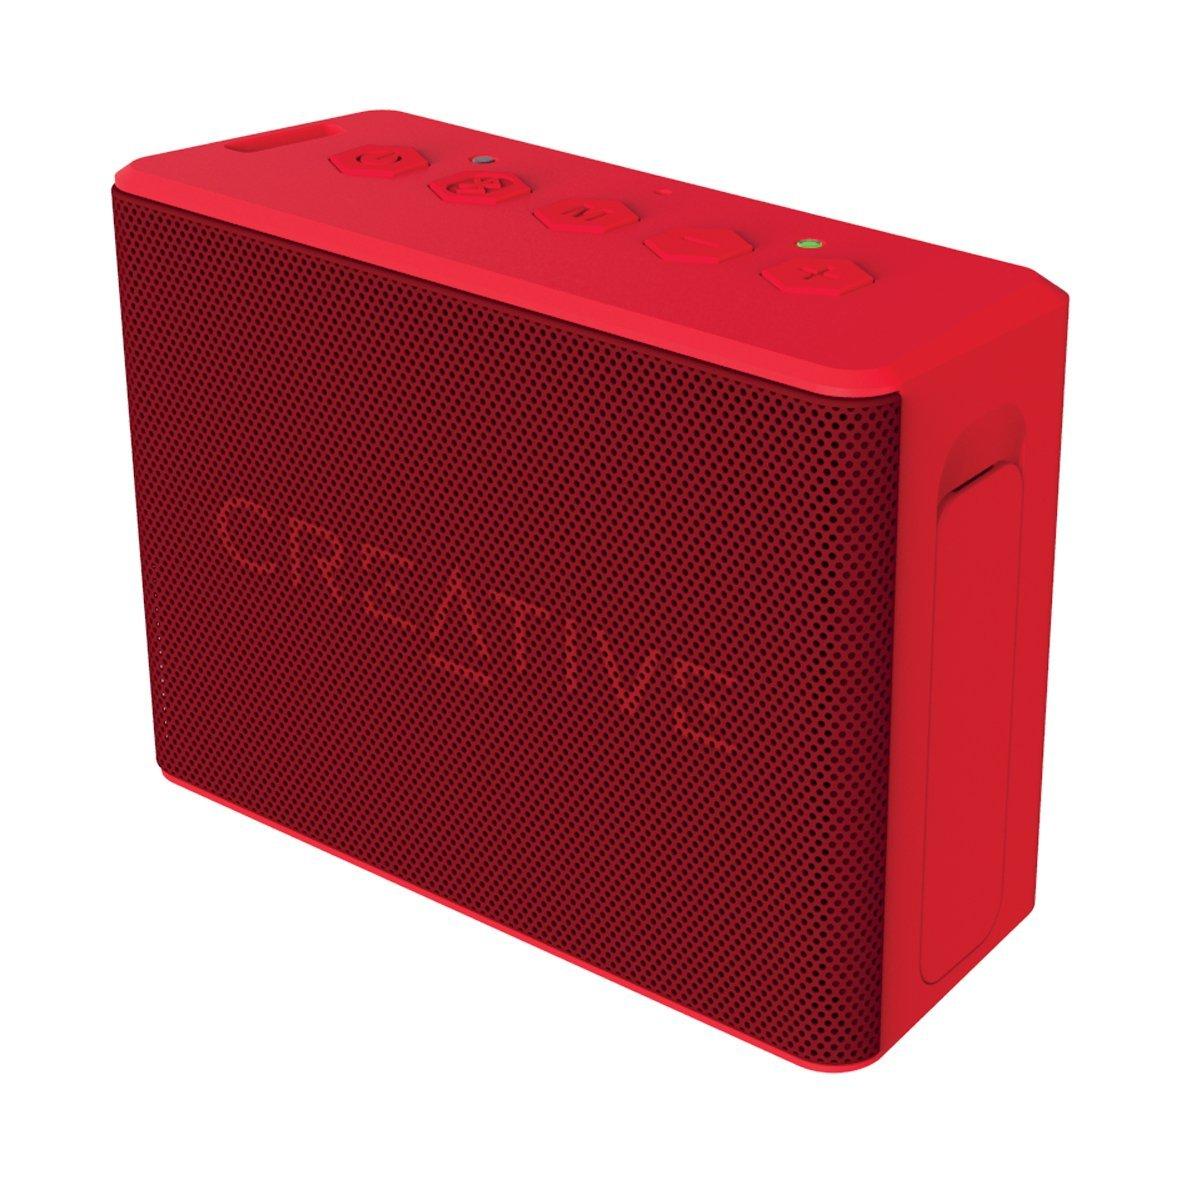 Creative MUVO c2 amazon